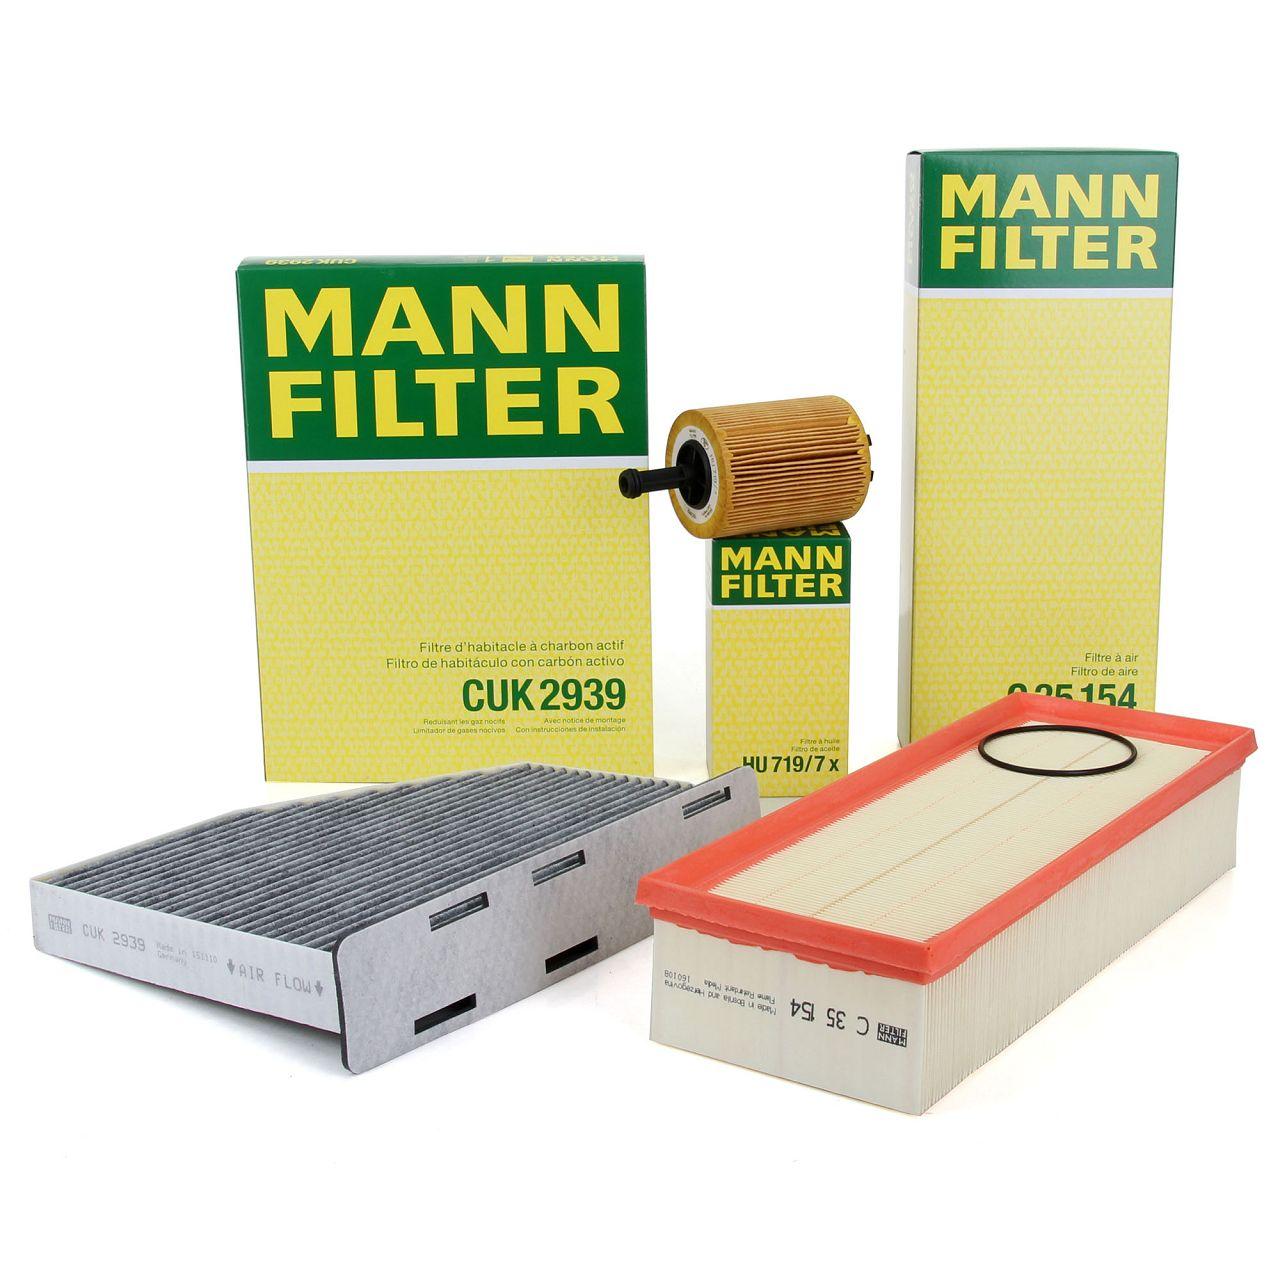 MANN Filterset für AUDI A3 TT SEAT SKODA VW GOLF 5 6 PASSAT TOURAN 1.9/2.0TDI